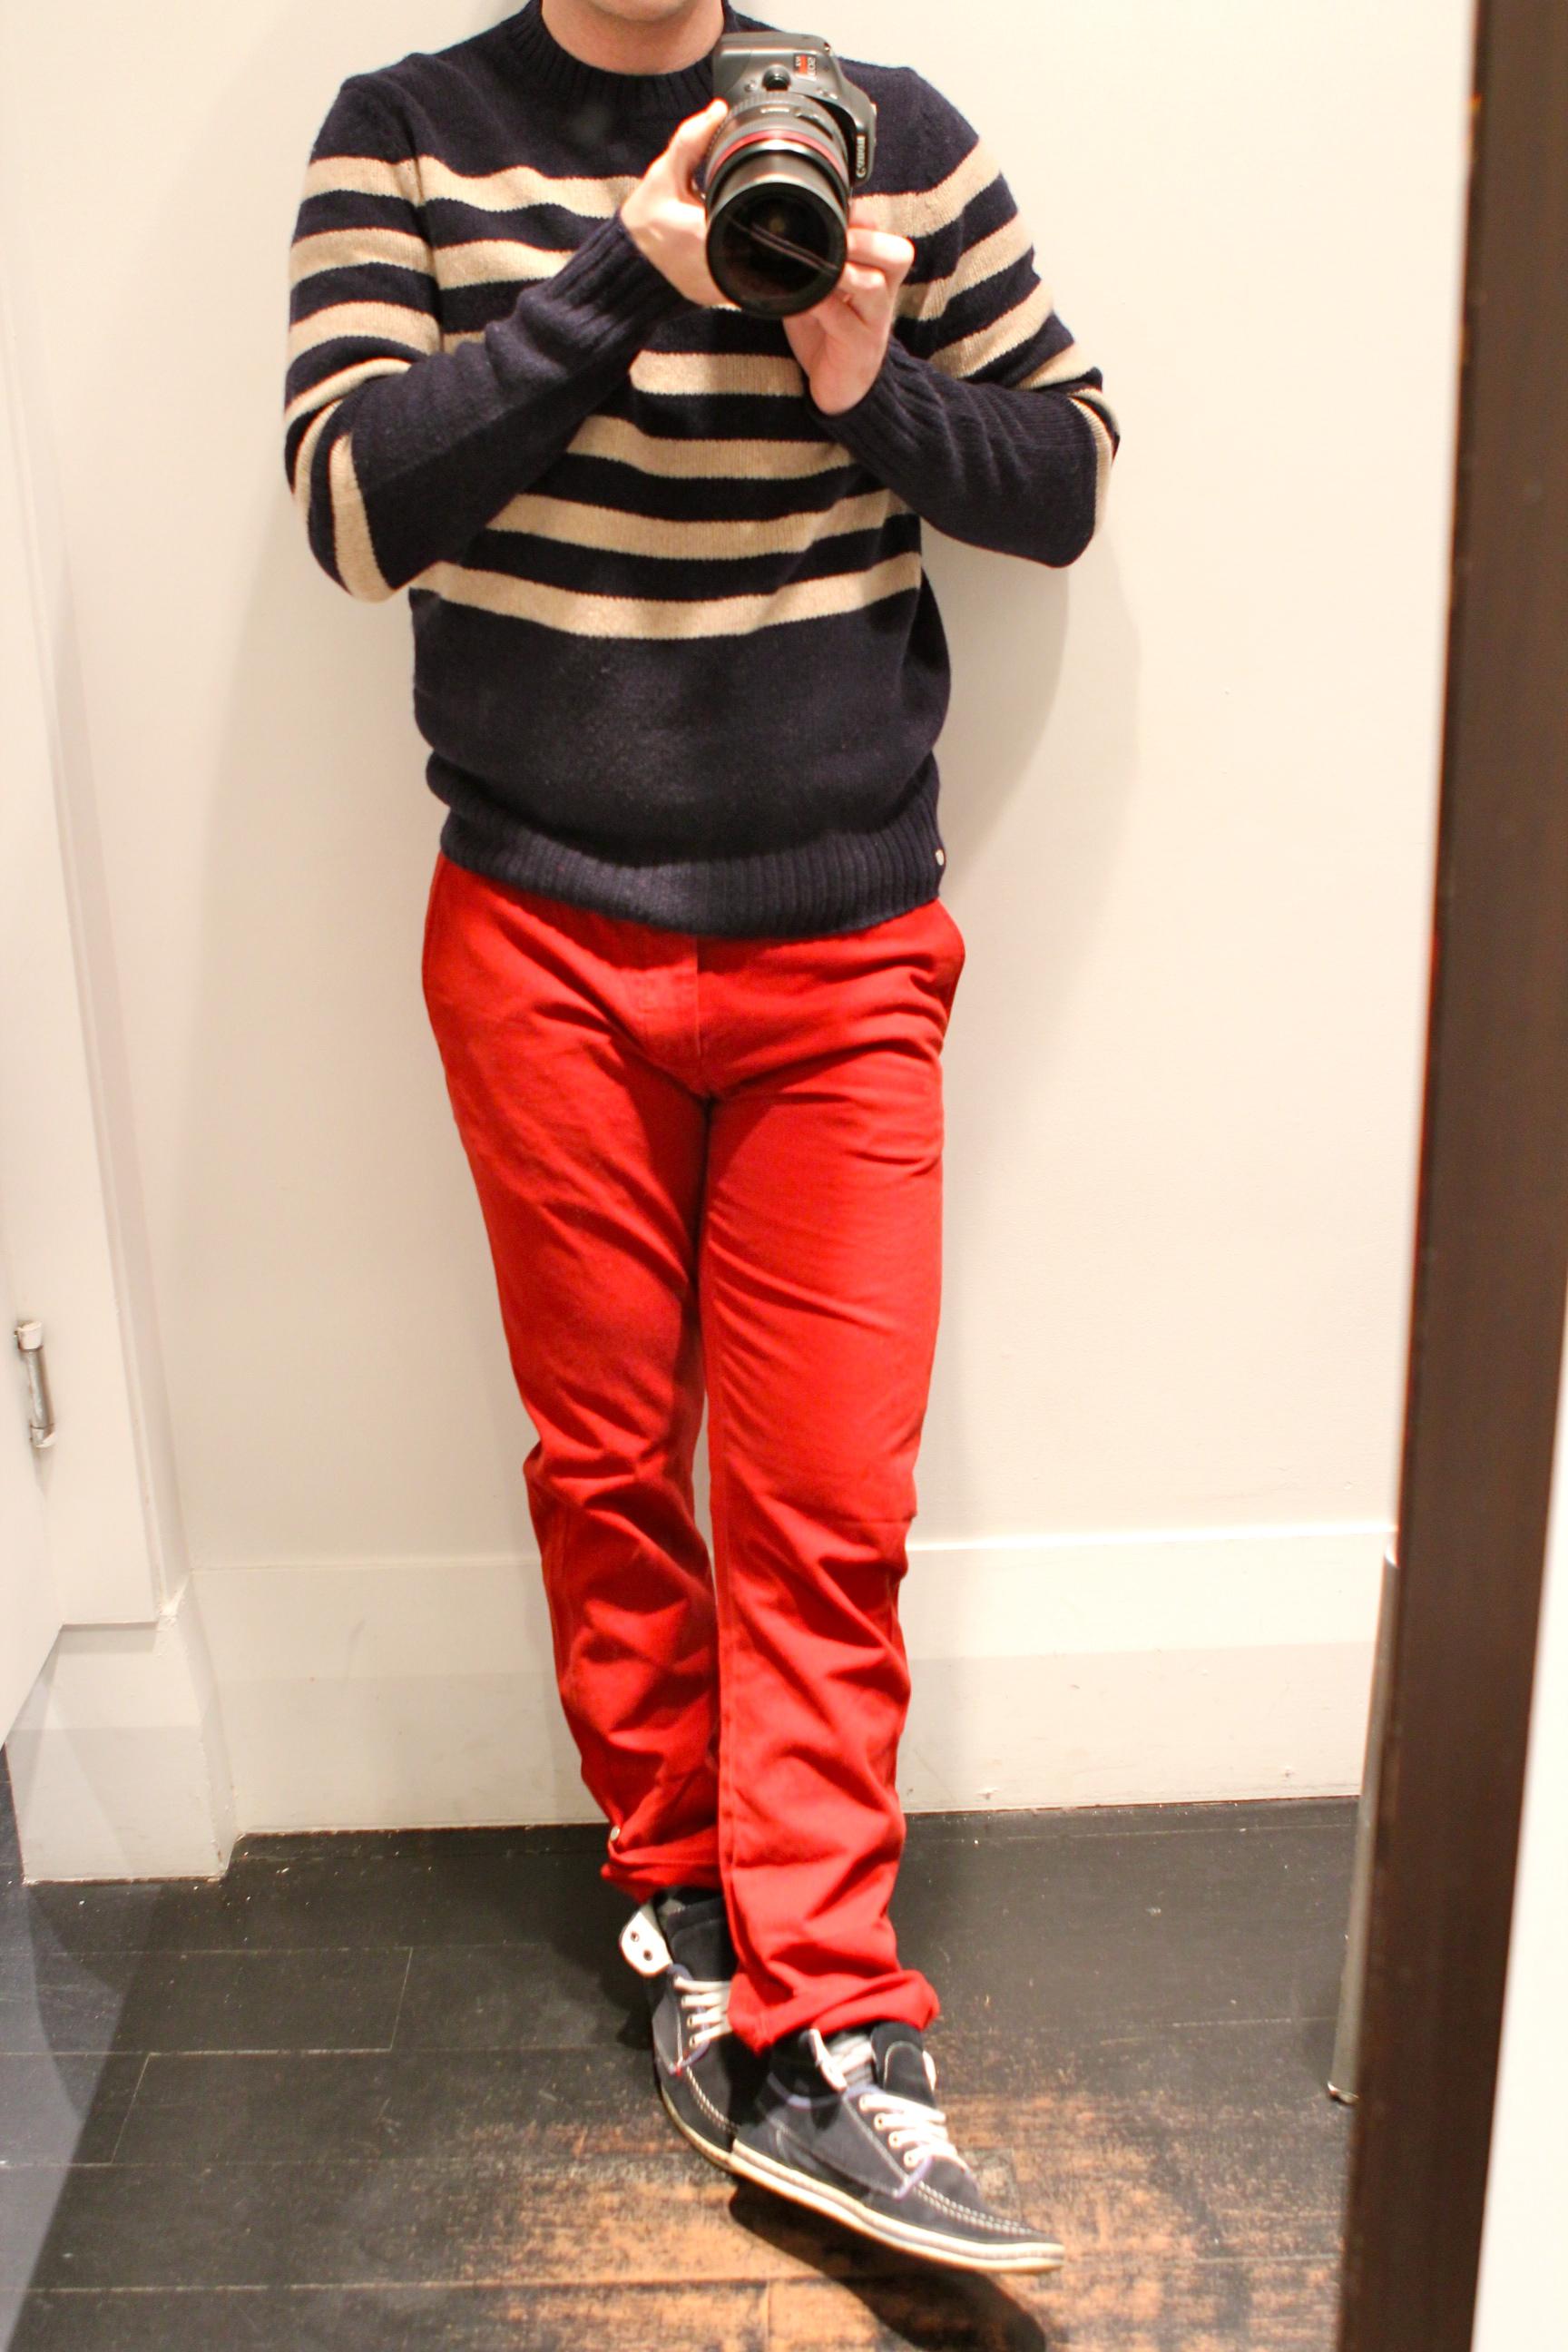 Red Pants + Blue Striped Sweater = Club Monaco Fun